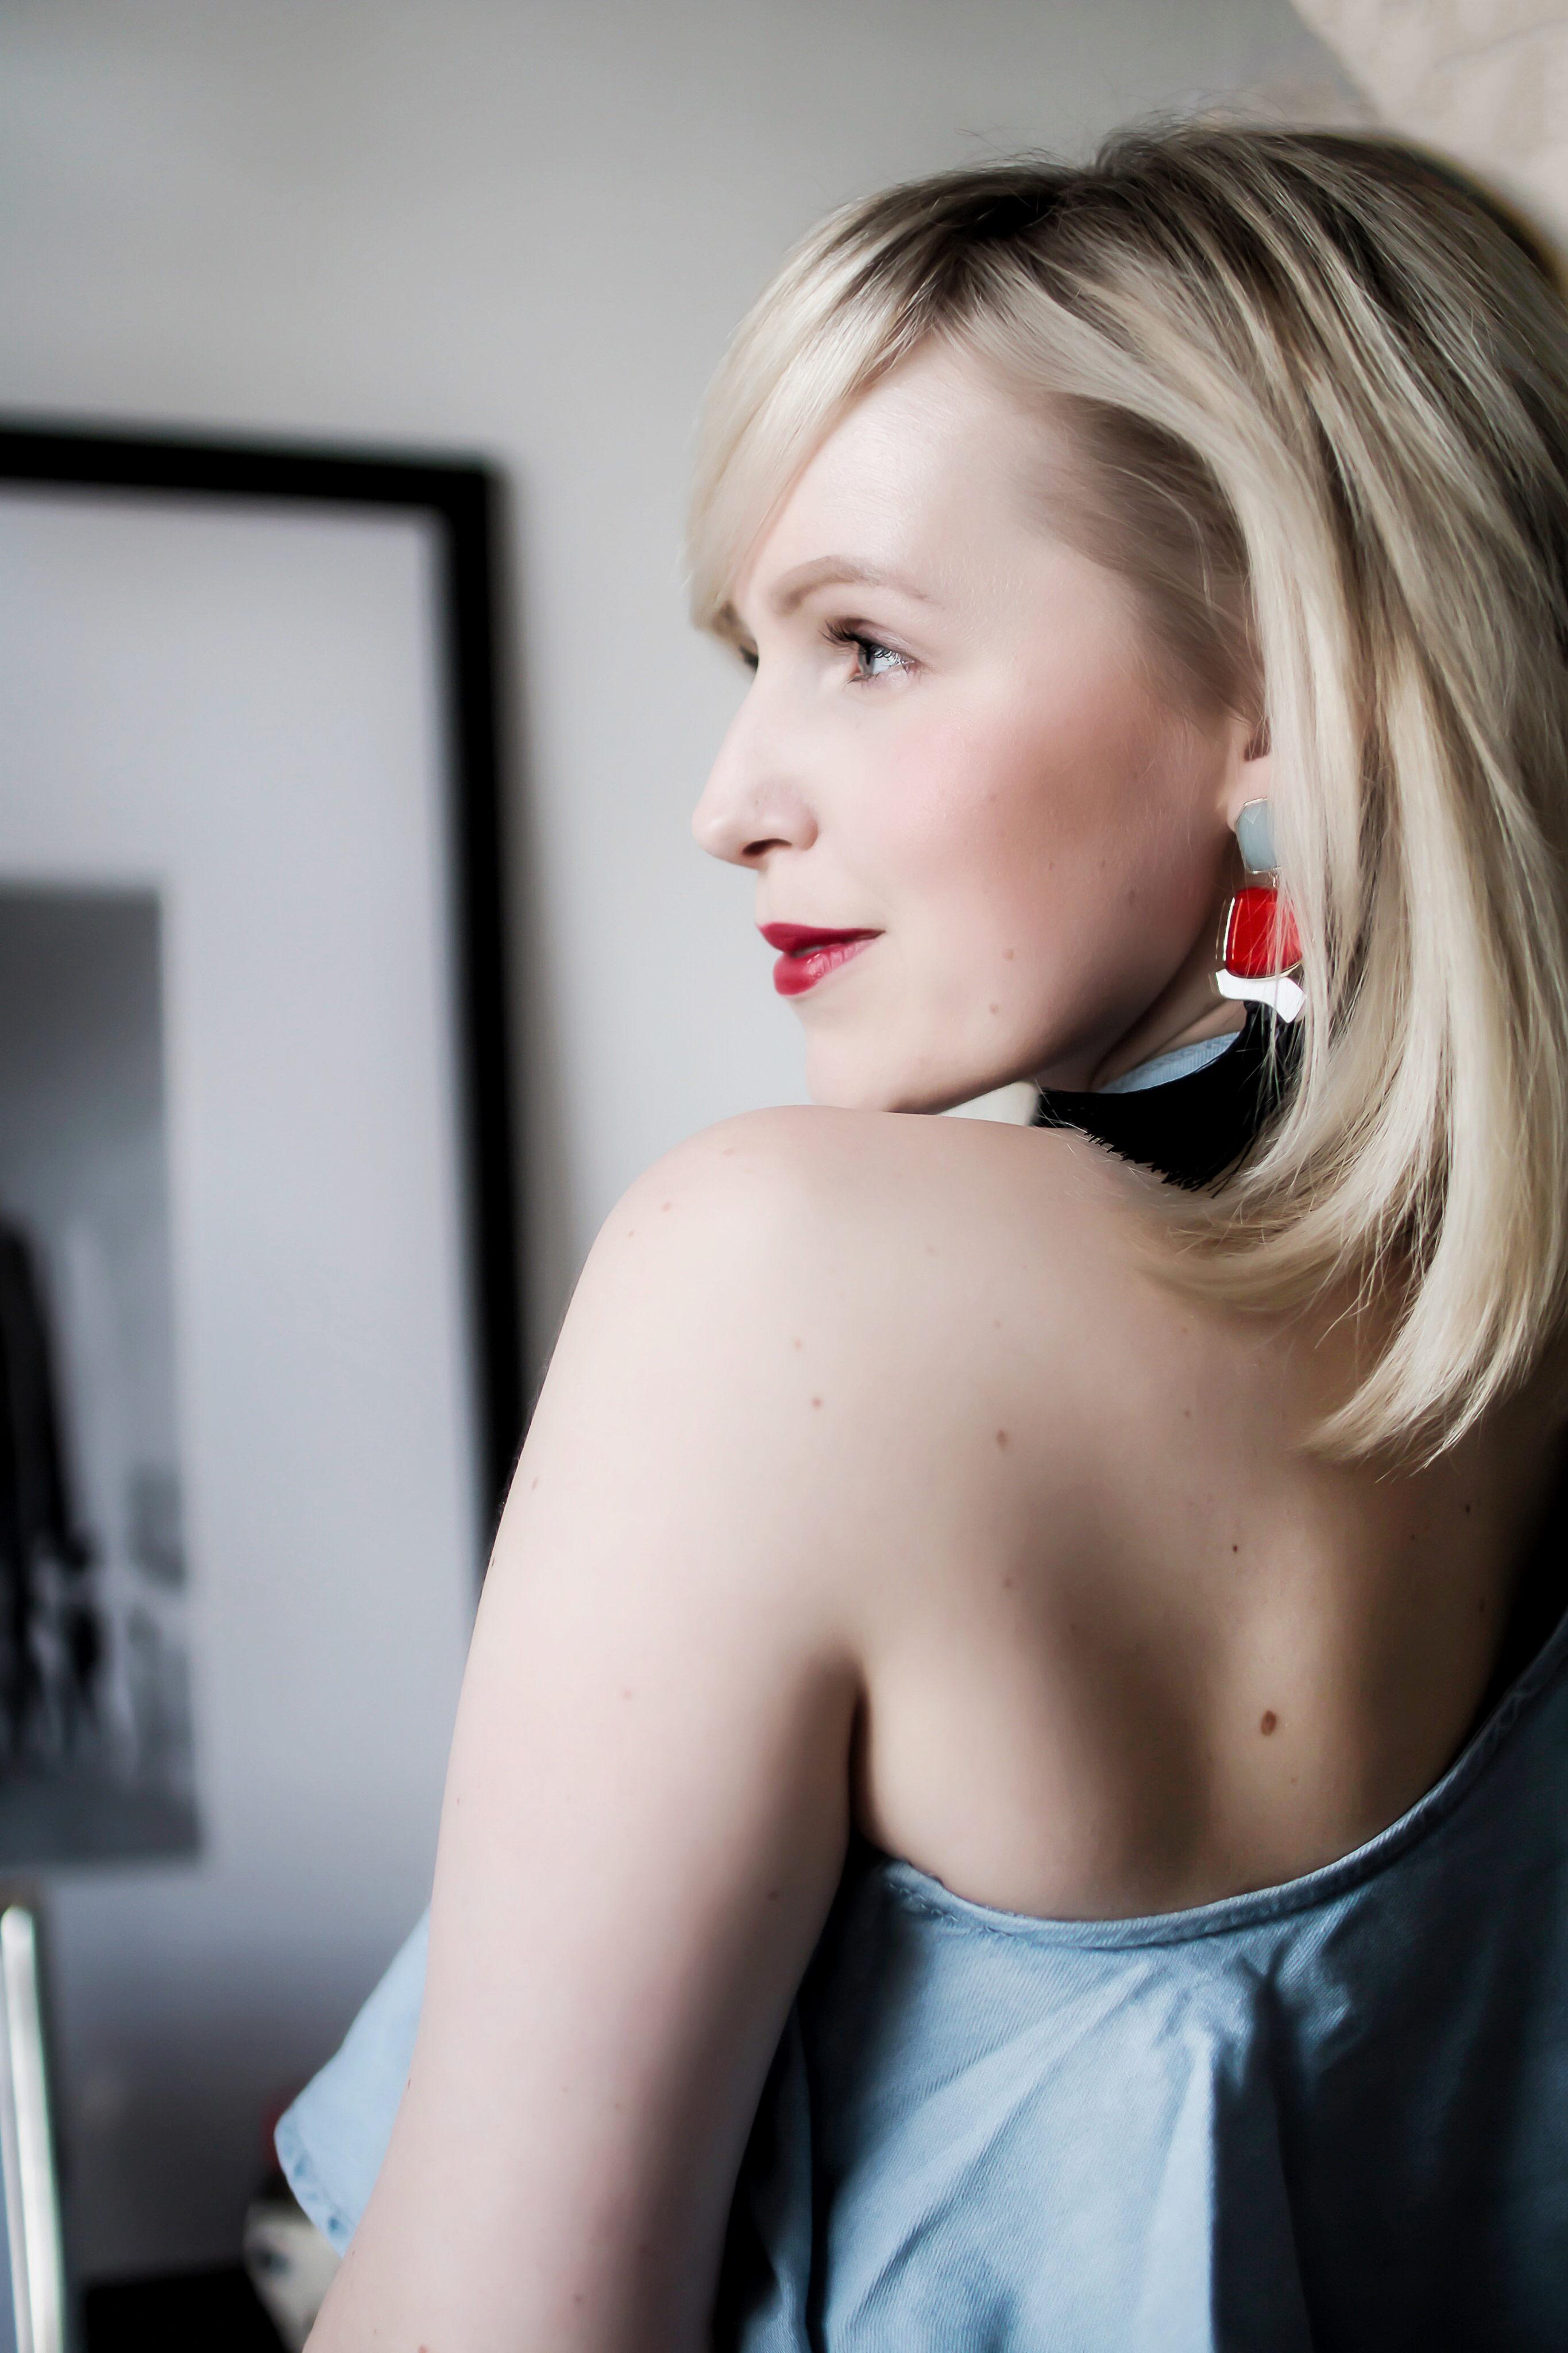 revlon beautymarke bei rossmann preiswert gwen Stefanie